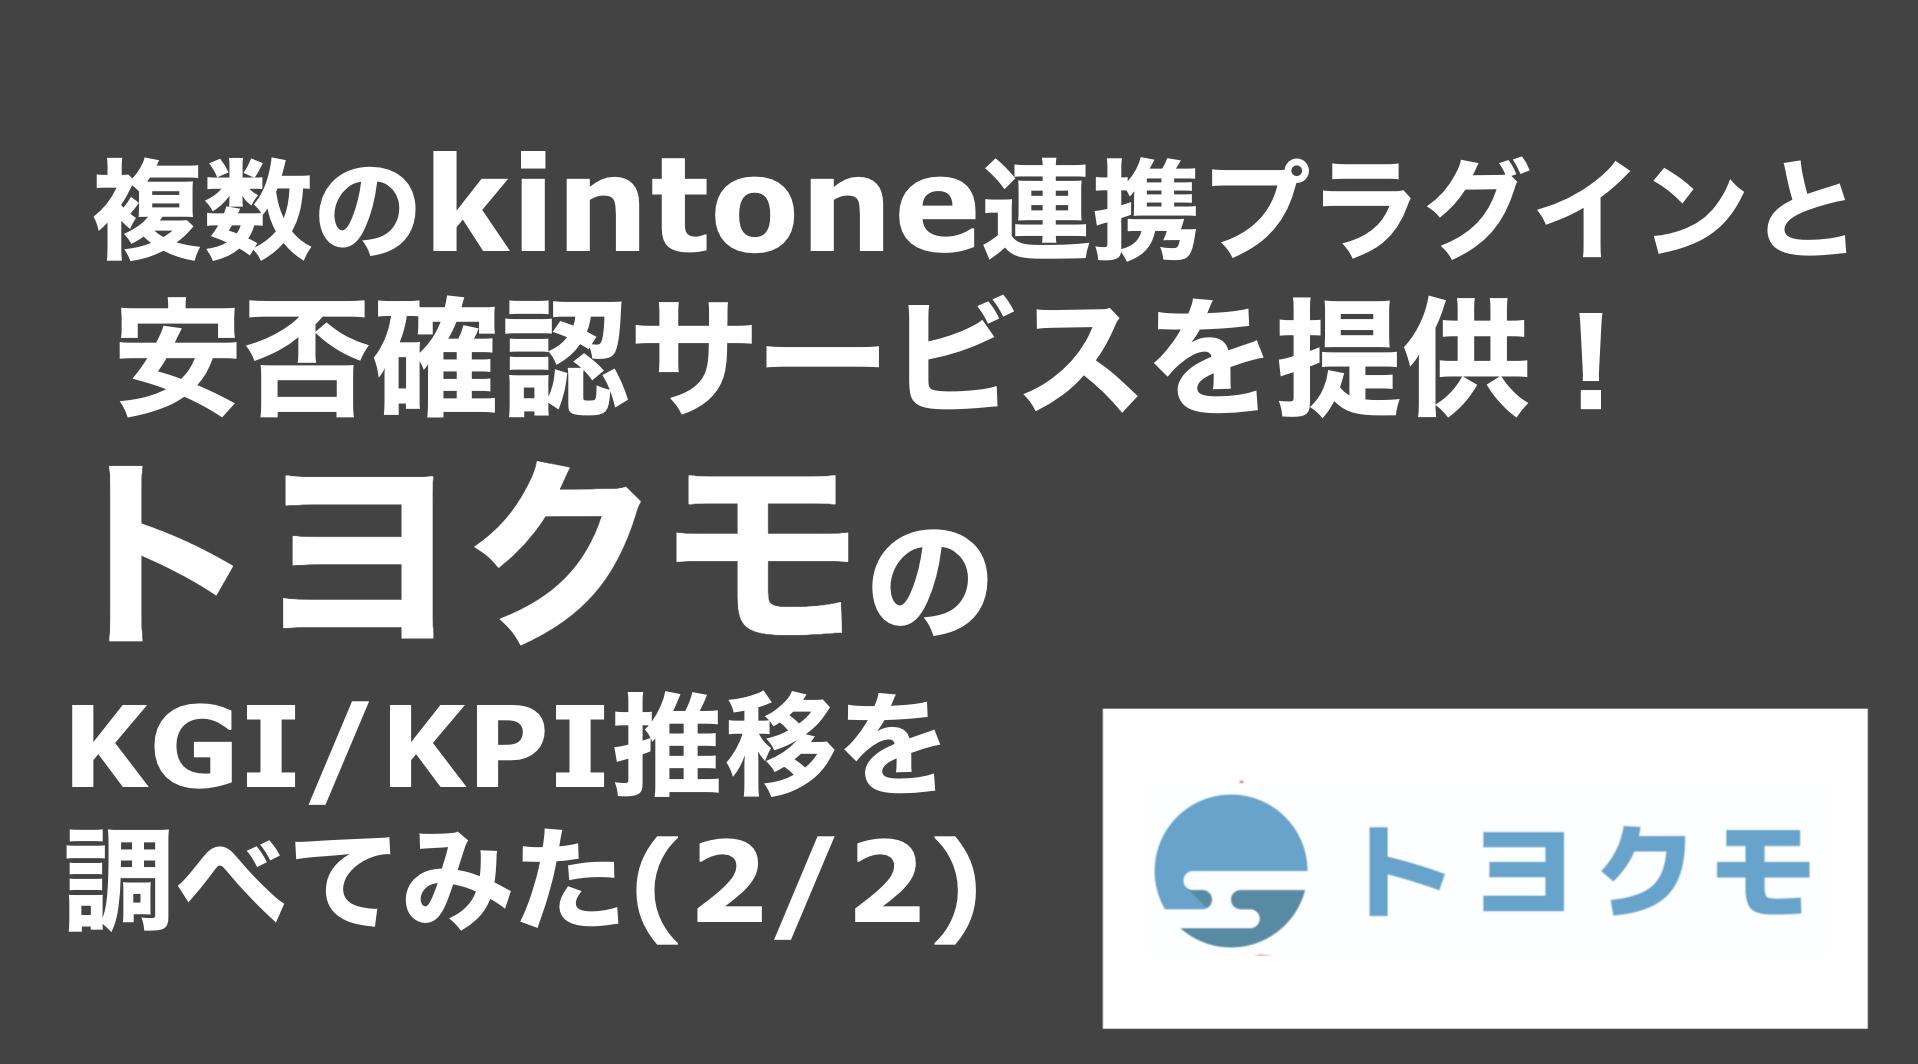 saaslife_複数のkintone連携プラグインと安否確認サービスを提供!トヨクモのKGI/KPI推移を調べてみた(2/2)